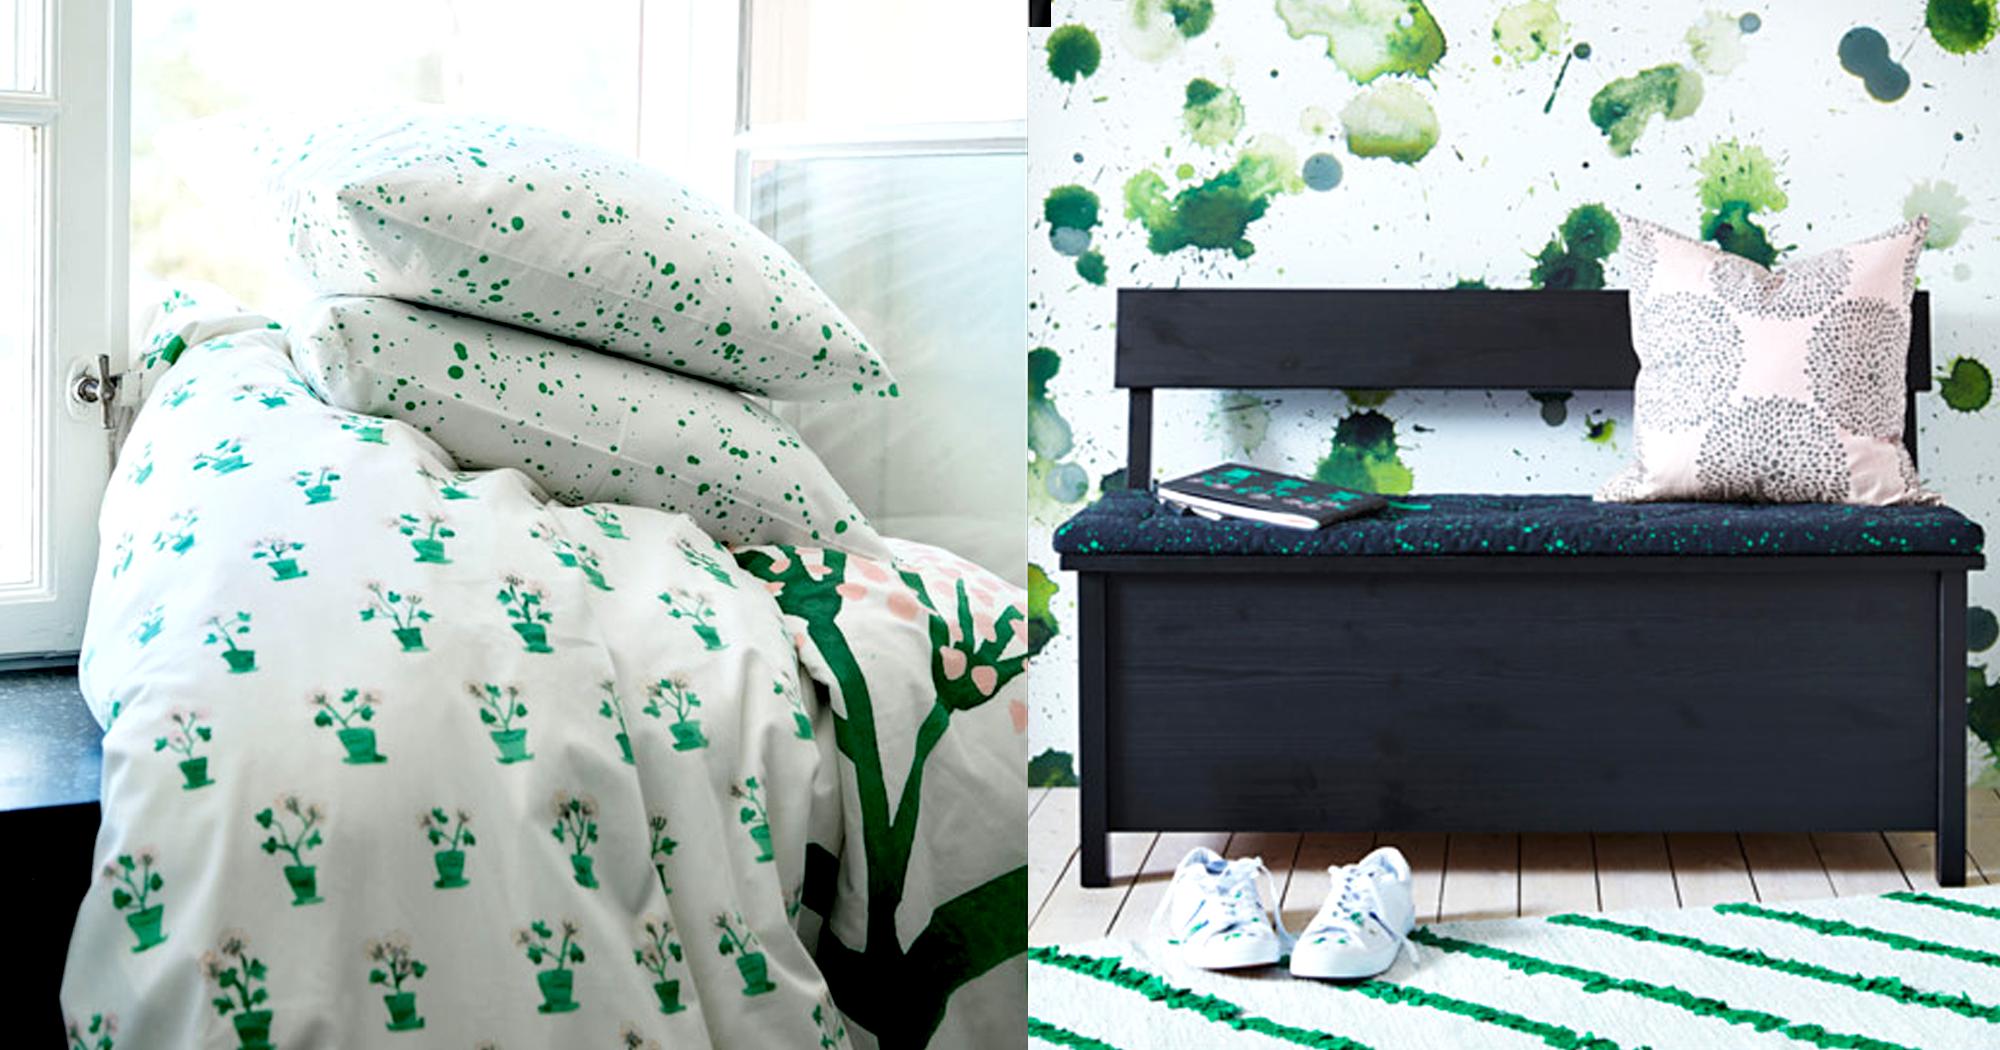 SÄLLSKAP: Die neue Ikea Kollektion schafft Stauraum